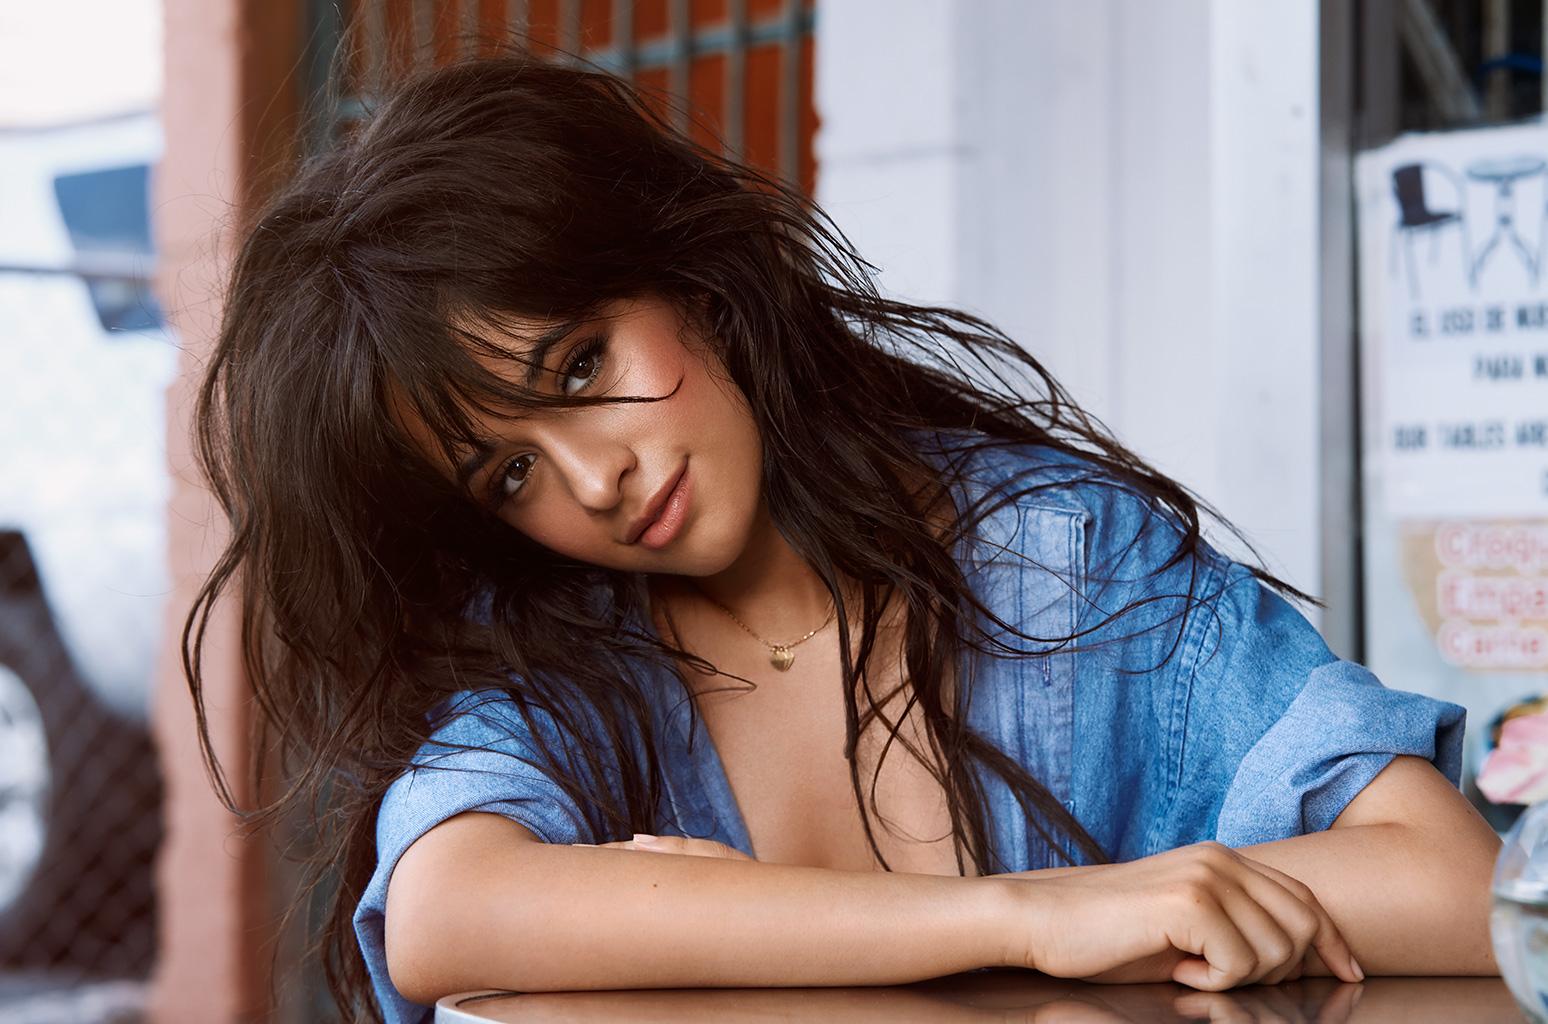 Review: Camila Cabello Eschews Bangers on Personal, Low-Key Solo Album